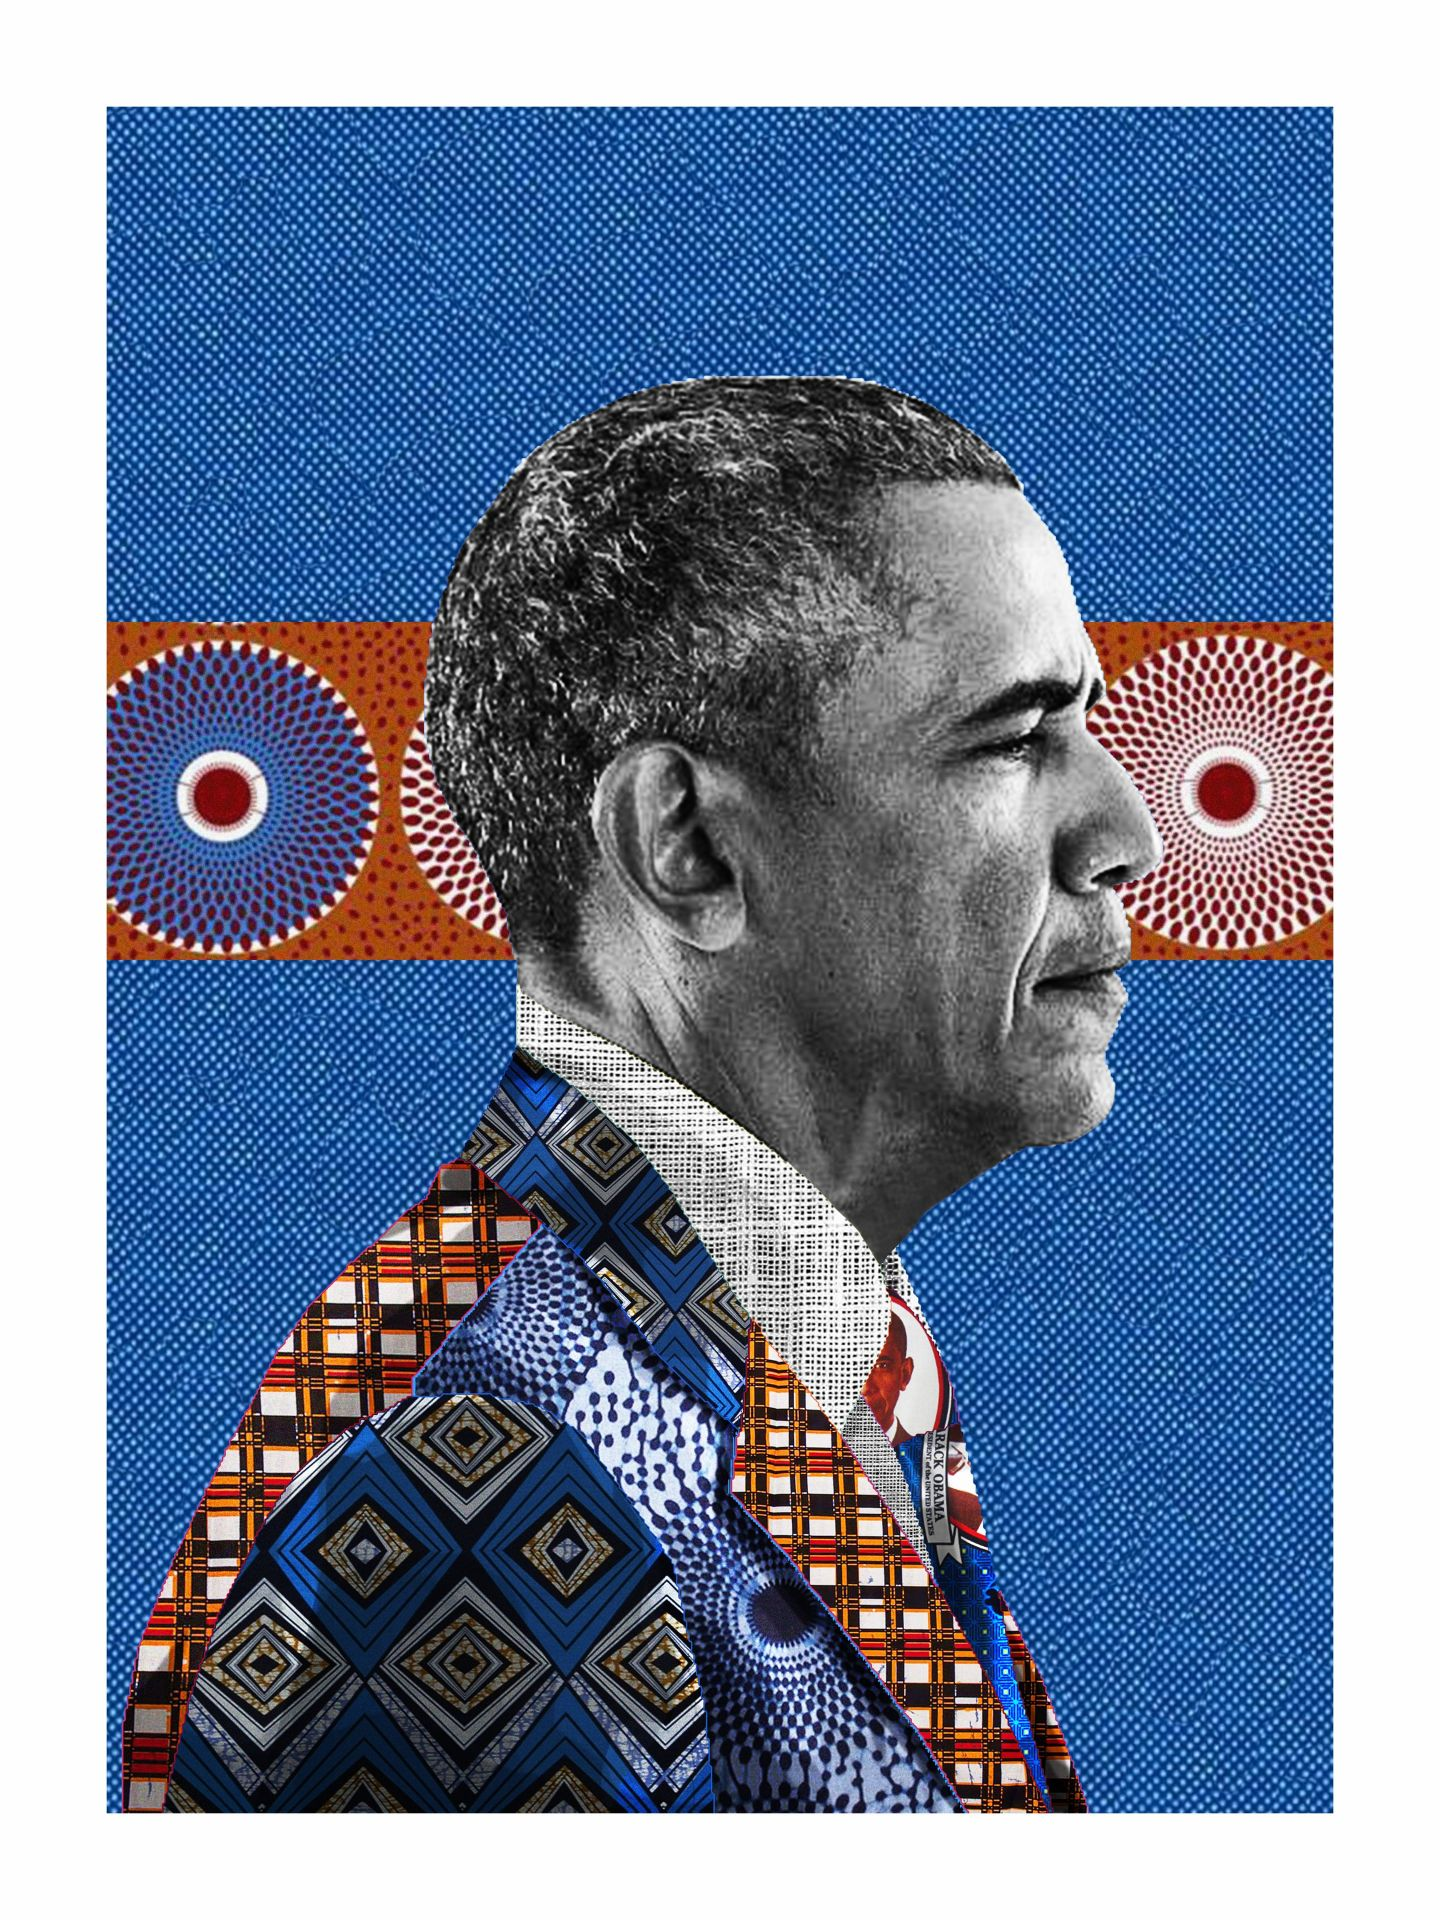 Original-OG-President-Obama-L-by-Makeba-KEEBS-Rainey-_noframe-1440x1920 Makeeba KEEBS Rainey Art Featured in Absolut Art